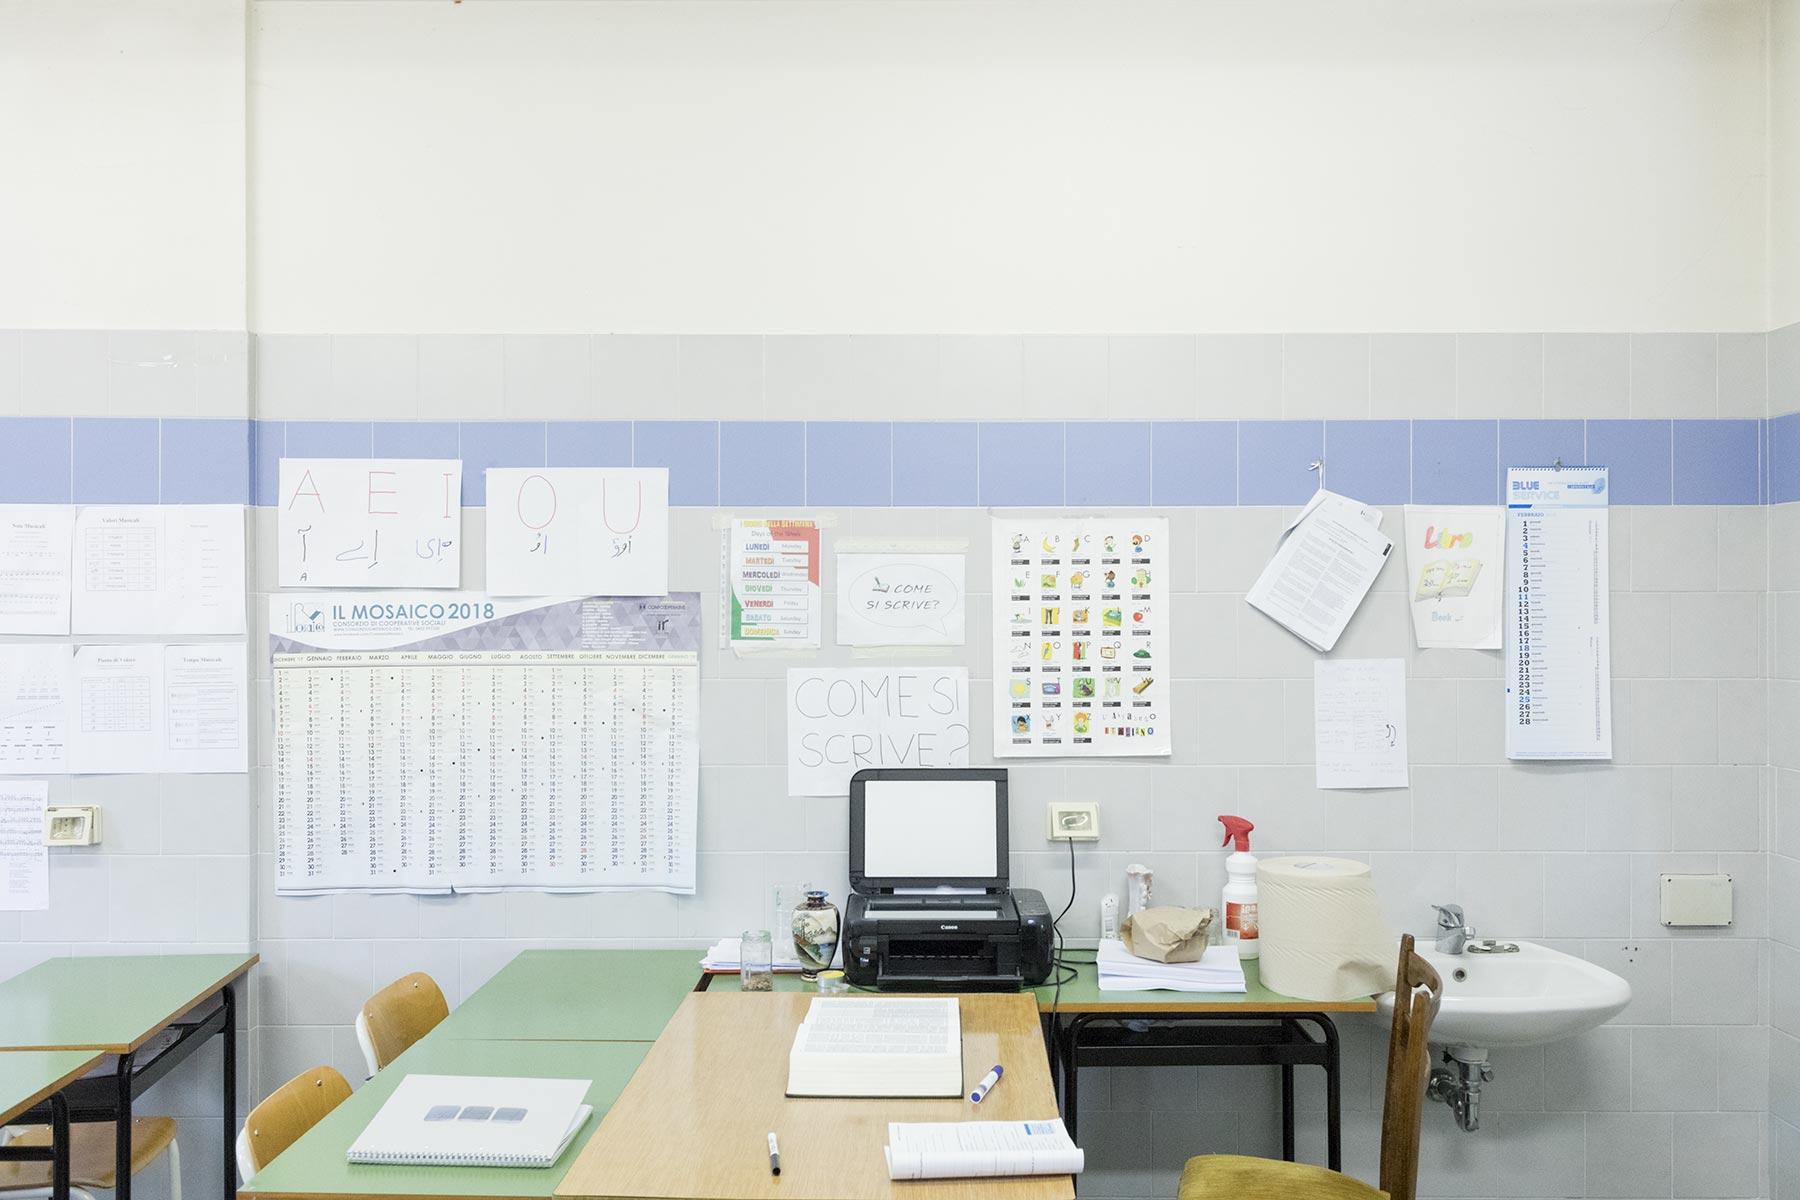 fabrizio-giraldi-manuela-schirra-migrants-room-aula-min